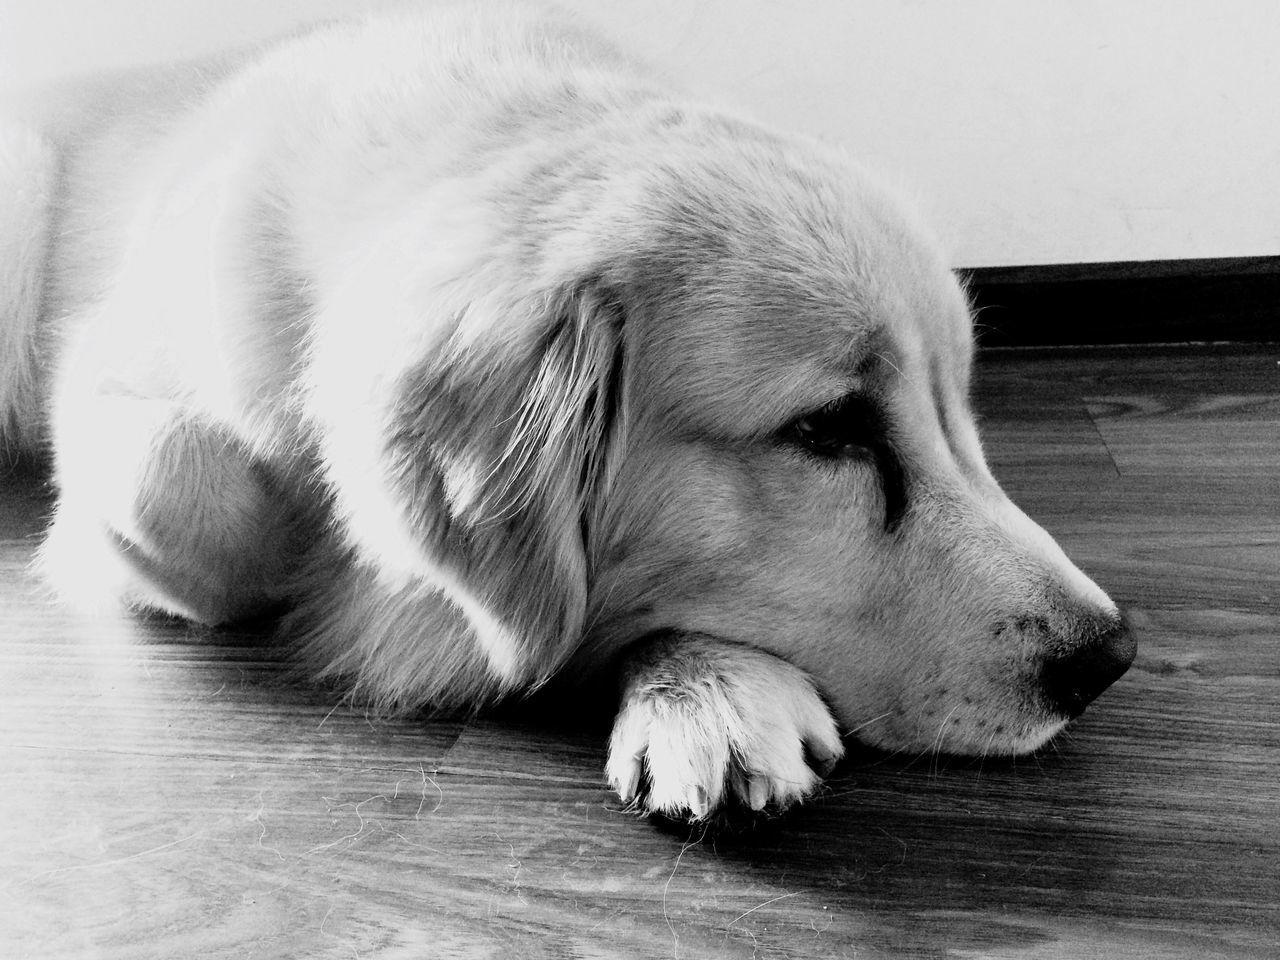 dog, pets, one animal, domestic animals, animal themes, mammal, indoors, sleeping, lying down, hardwood floor, close-up, relaxation, no people, day